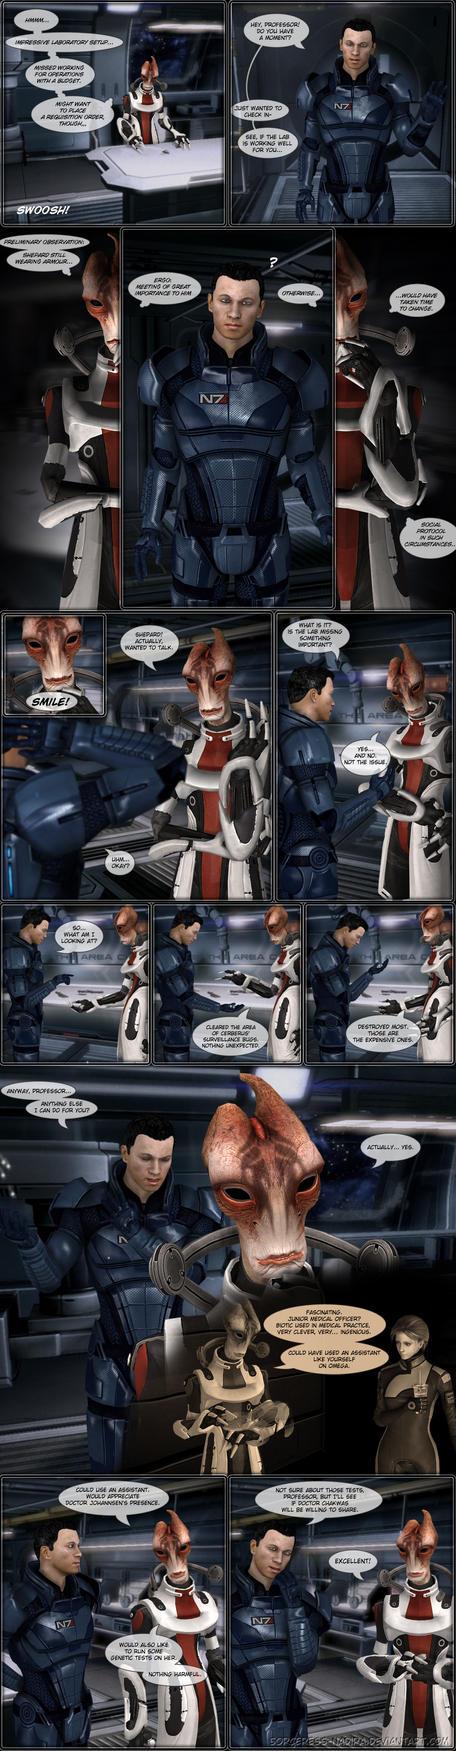 Biomedic's Log - comic entry 3 by Sorceress-Nadira